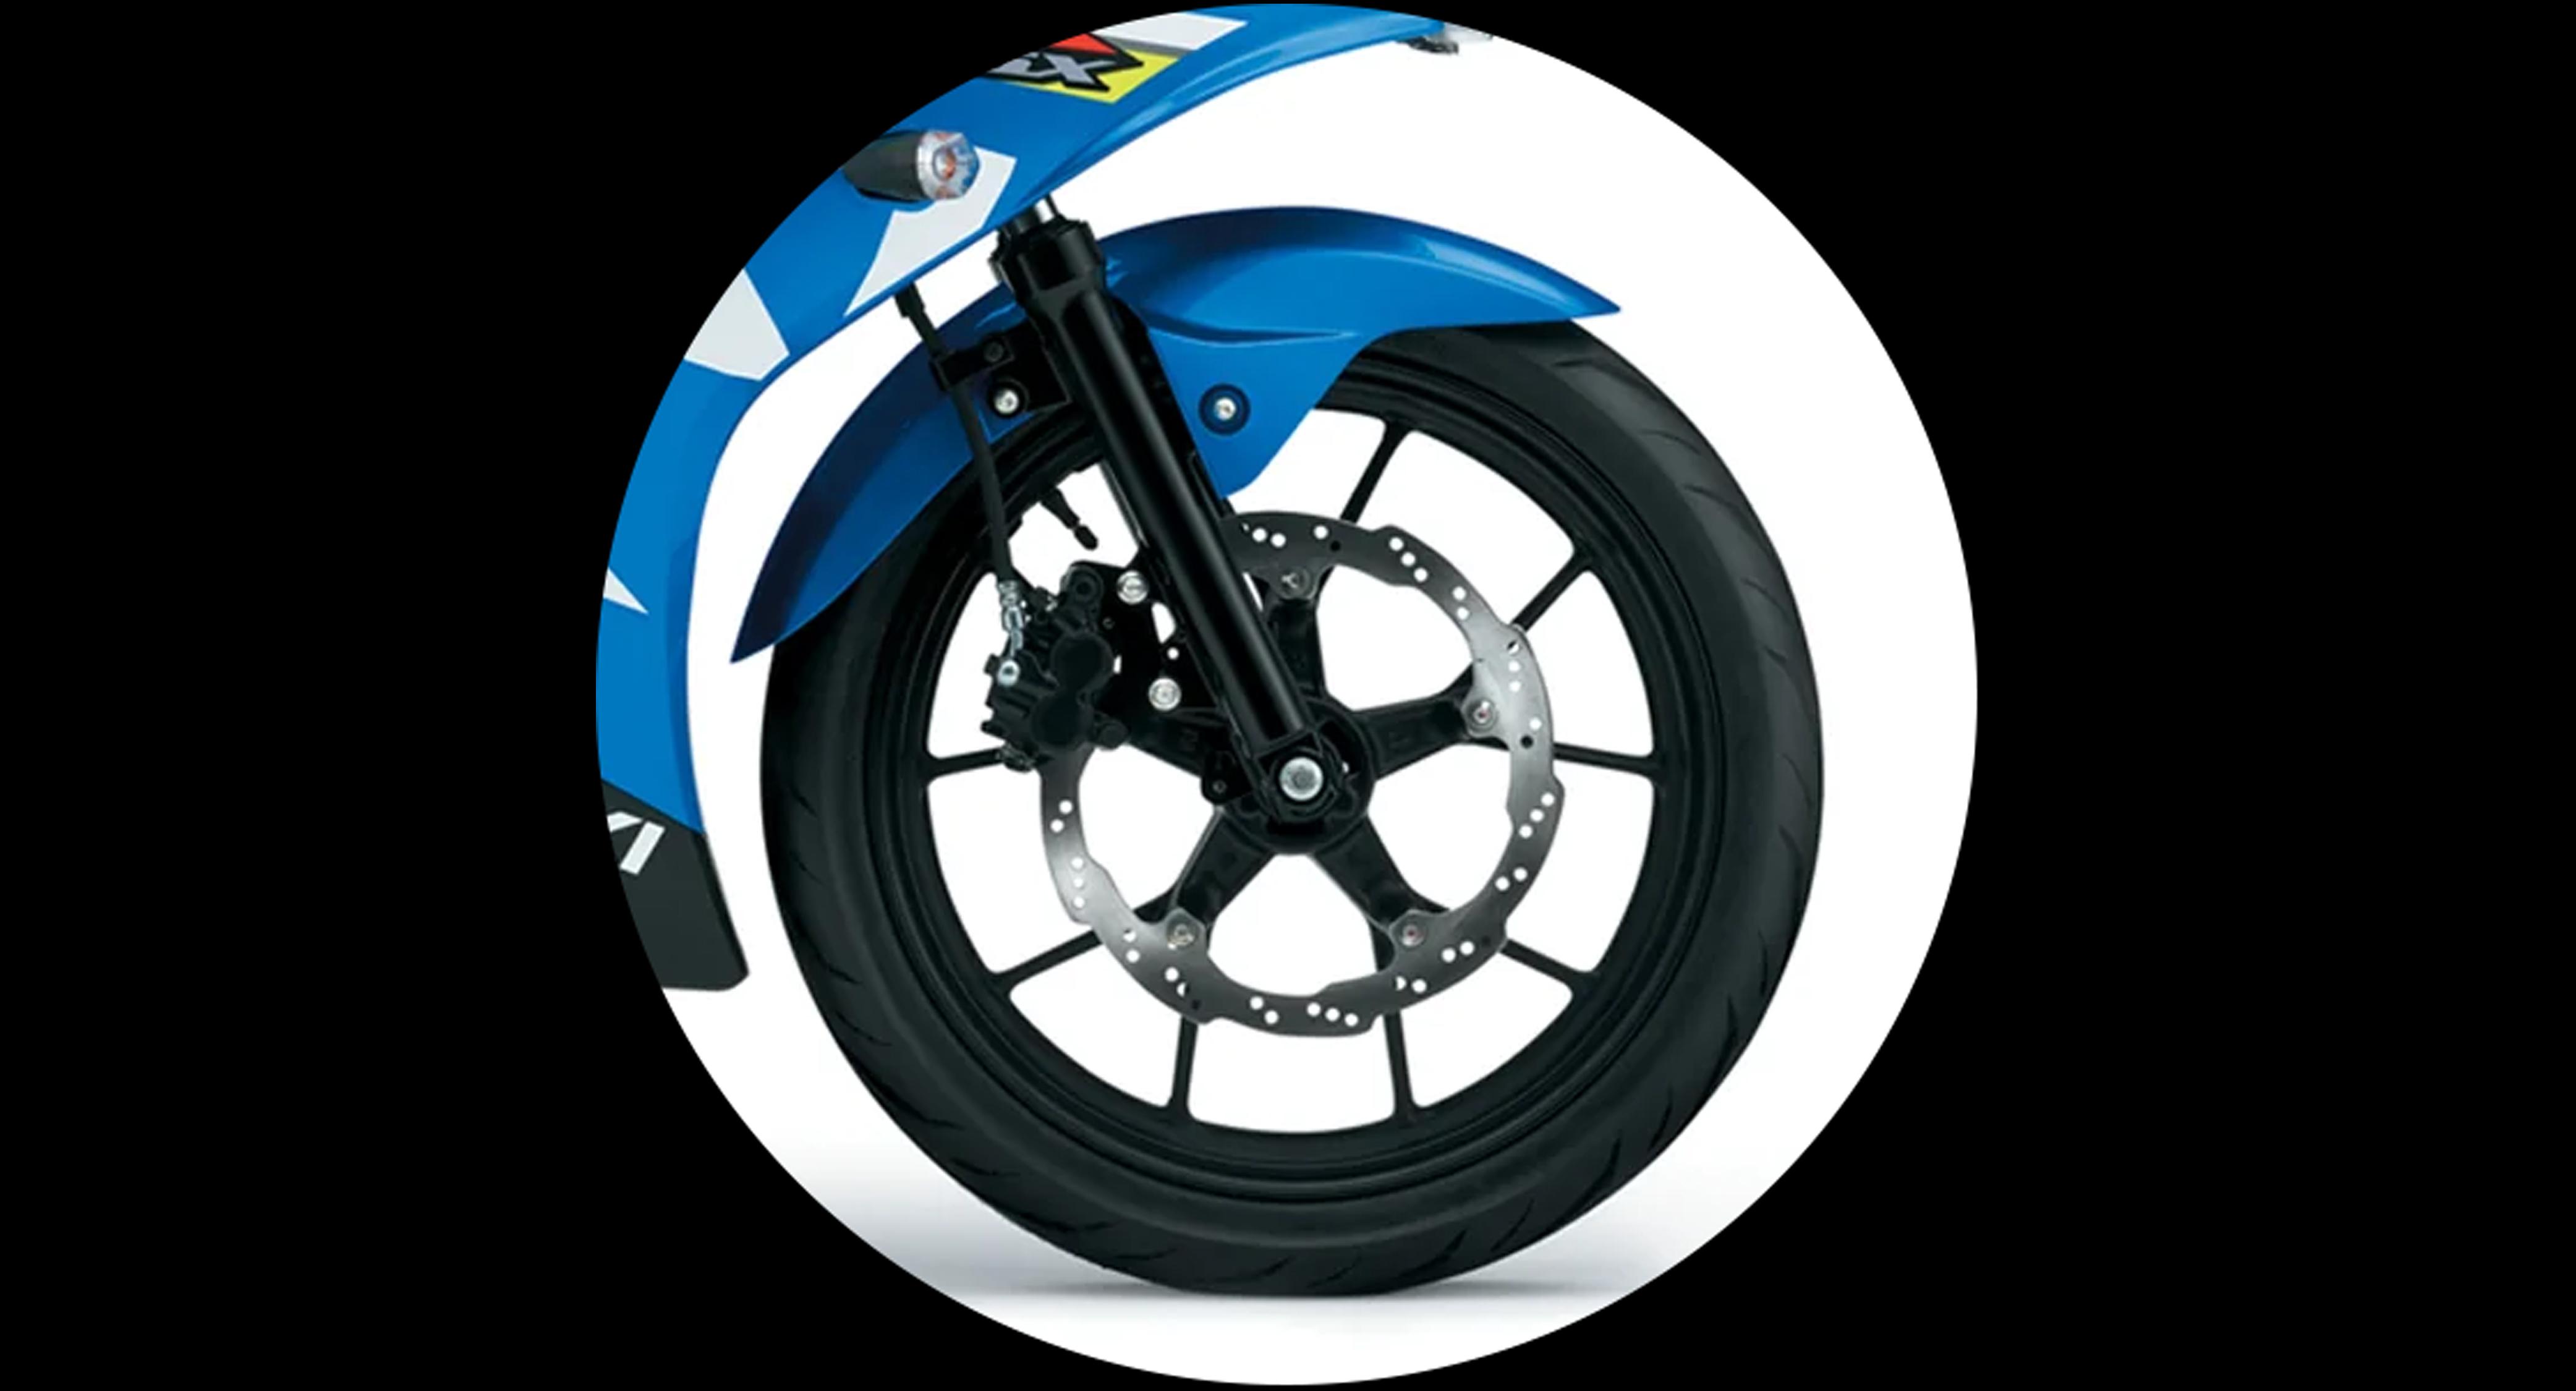 Disc Brake and Tubeless Tire and 10 Spoke Wheel